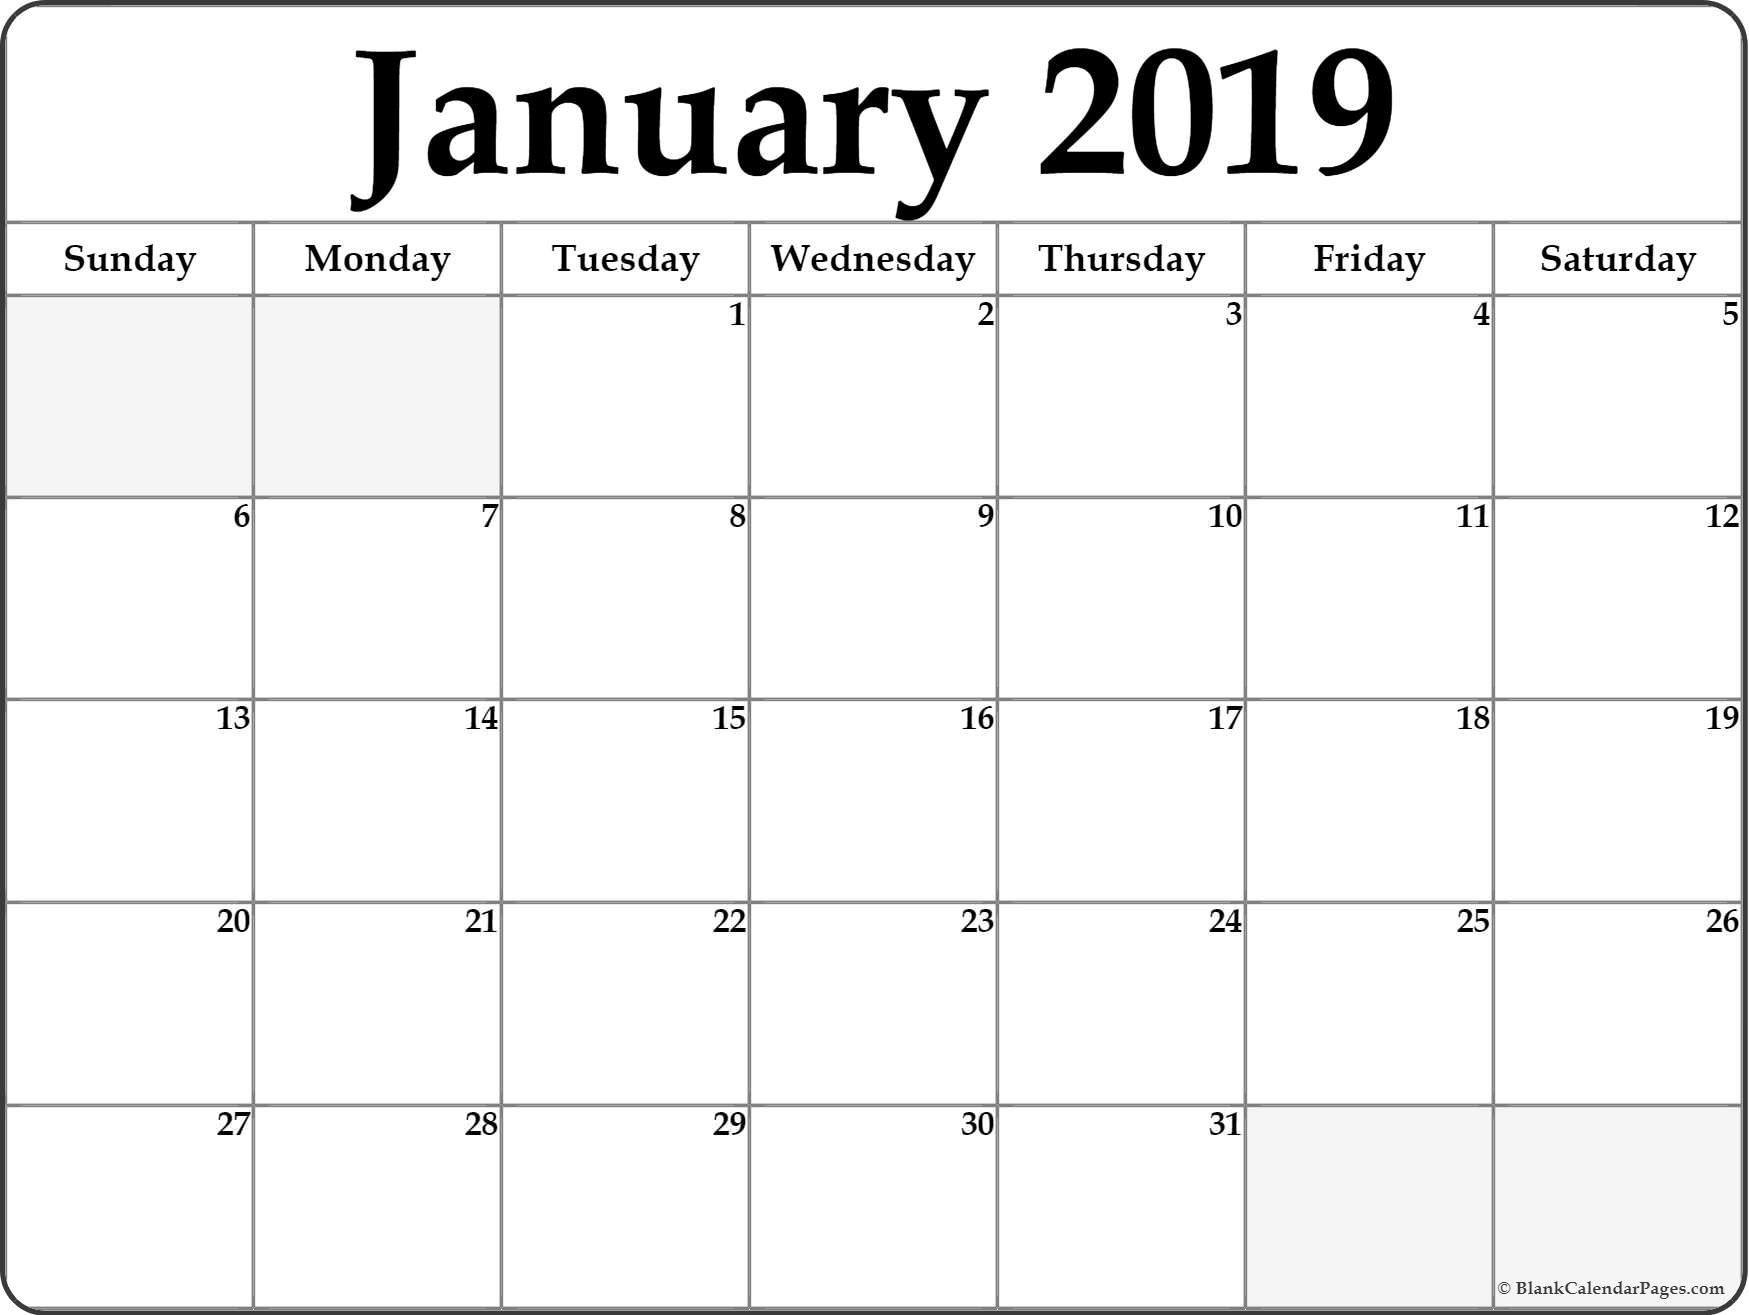 Image Result For Printable 2019 Calendar | Calendars & Planners Calendar 2019 Template